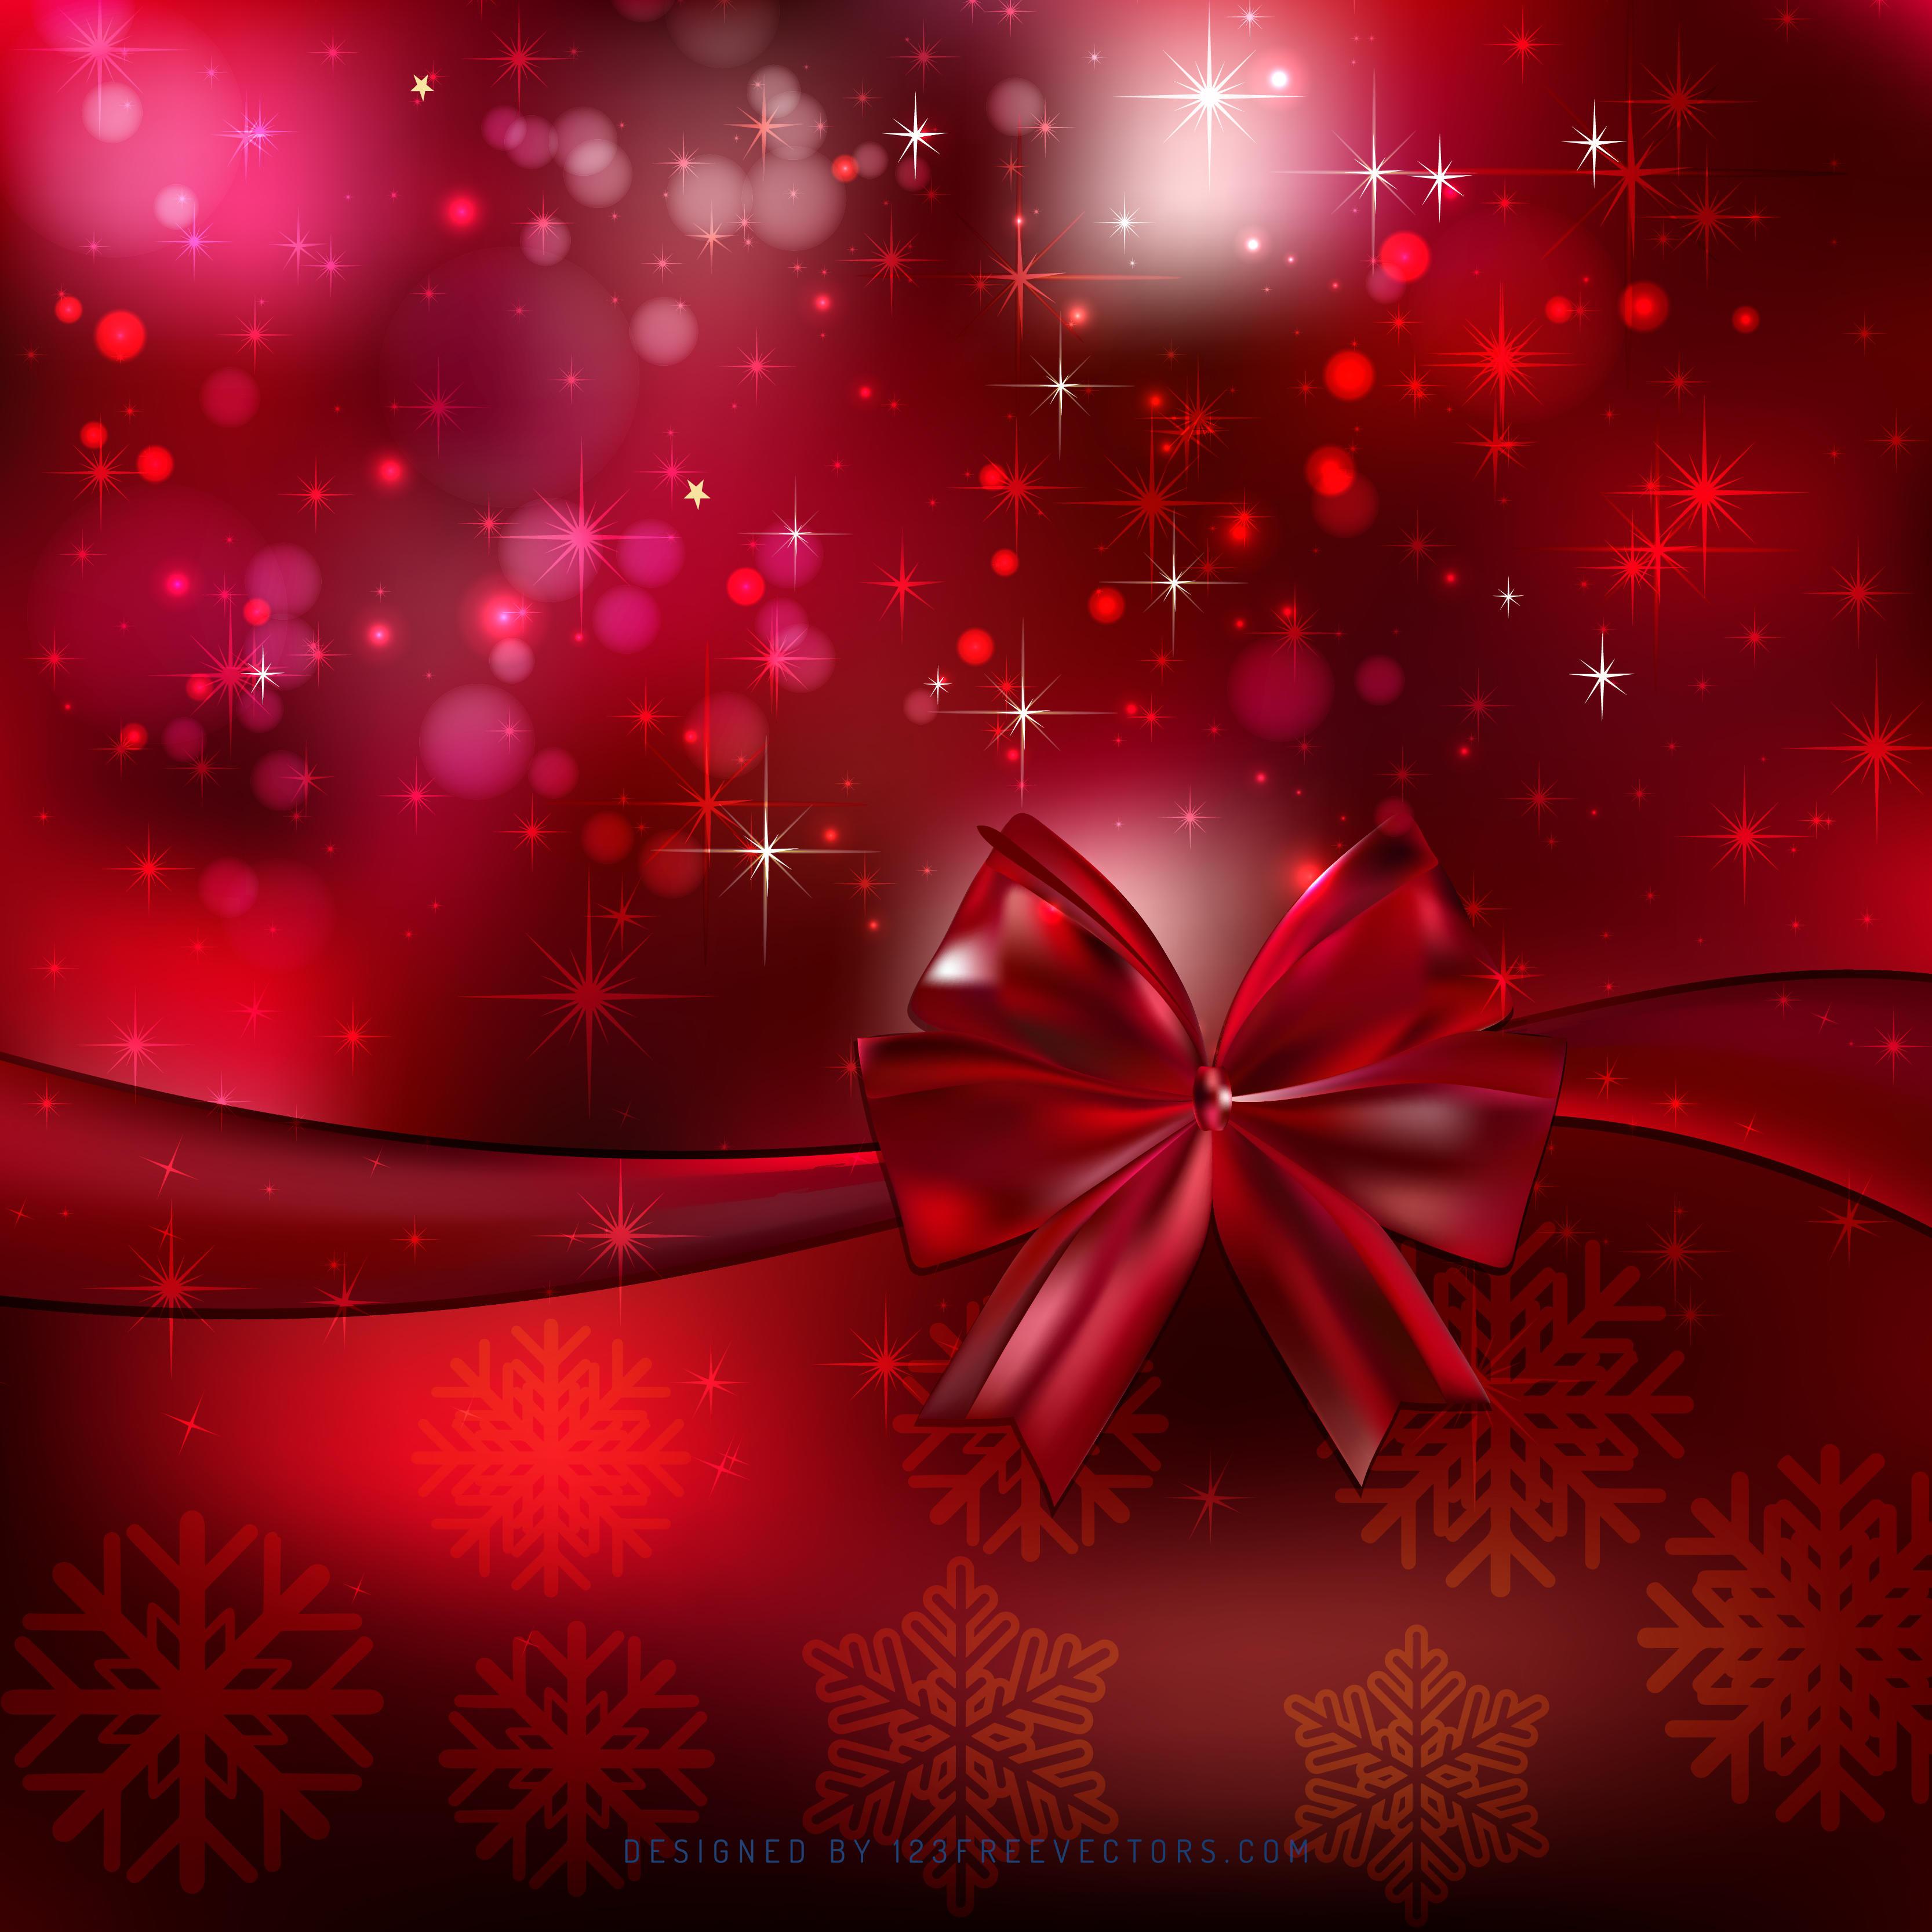 dark red christmas bow background design 123freevectors - Red Christmas Background